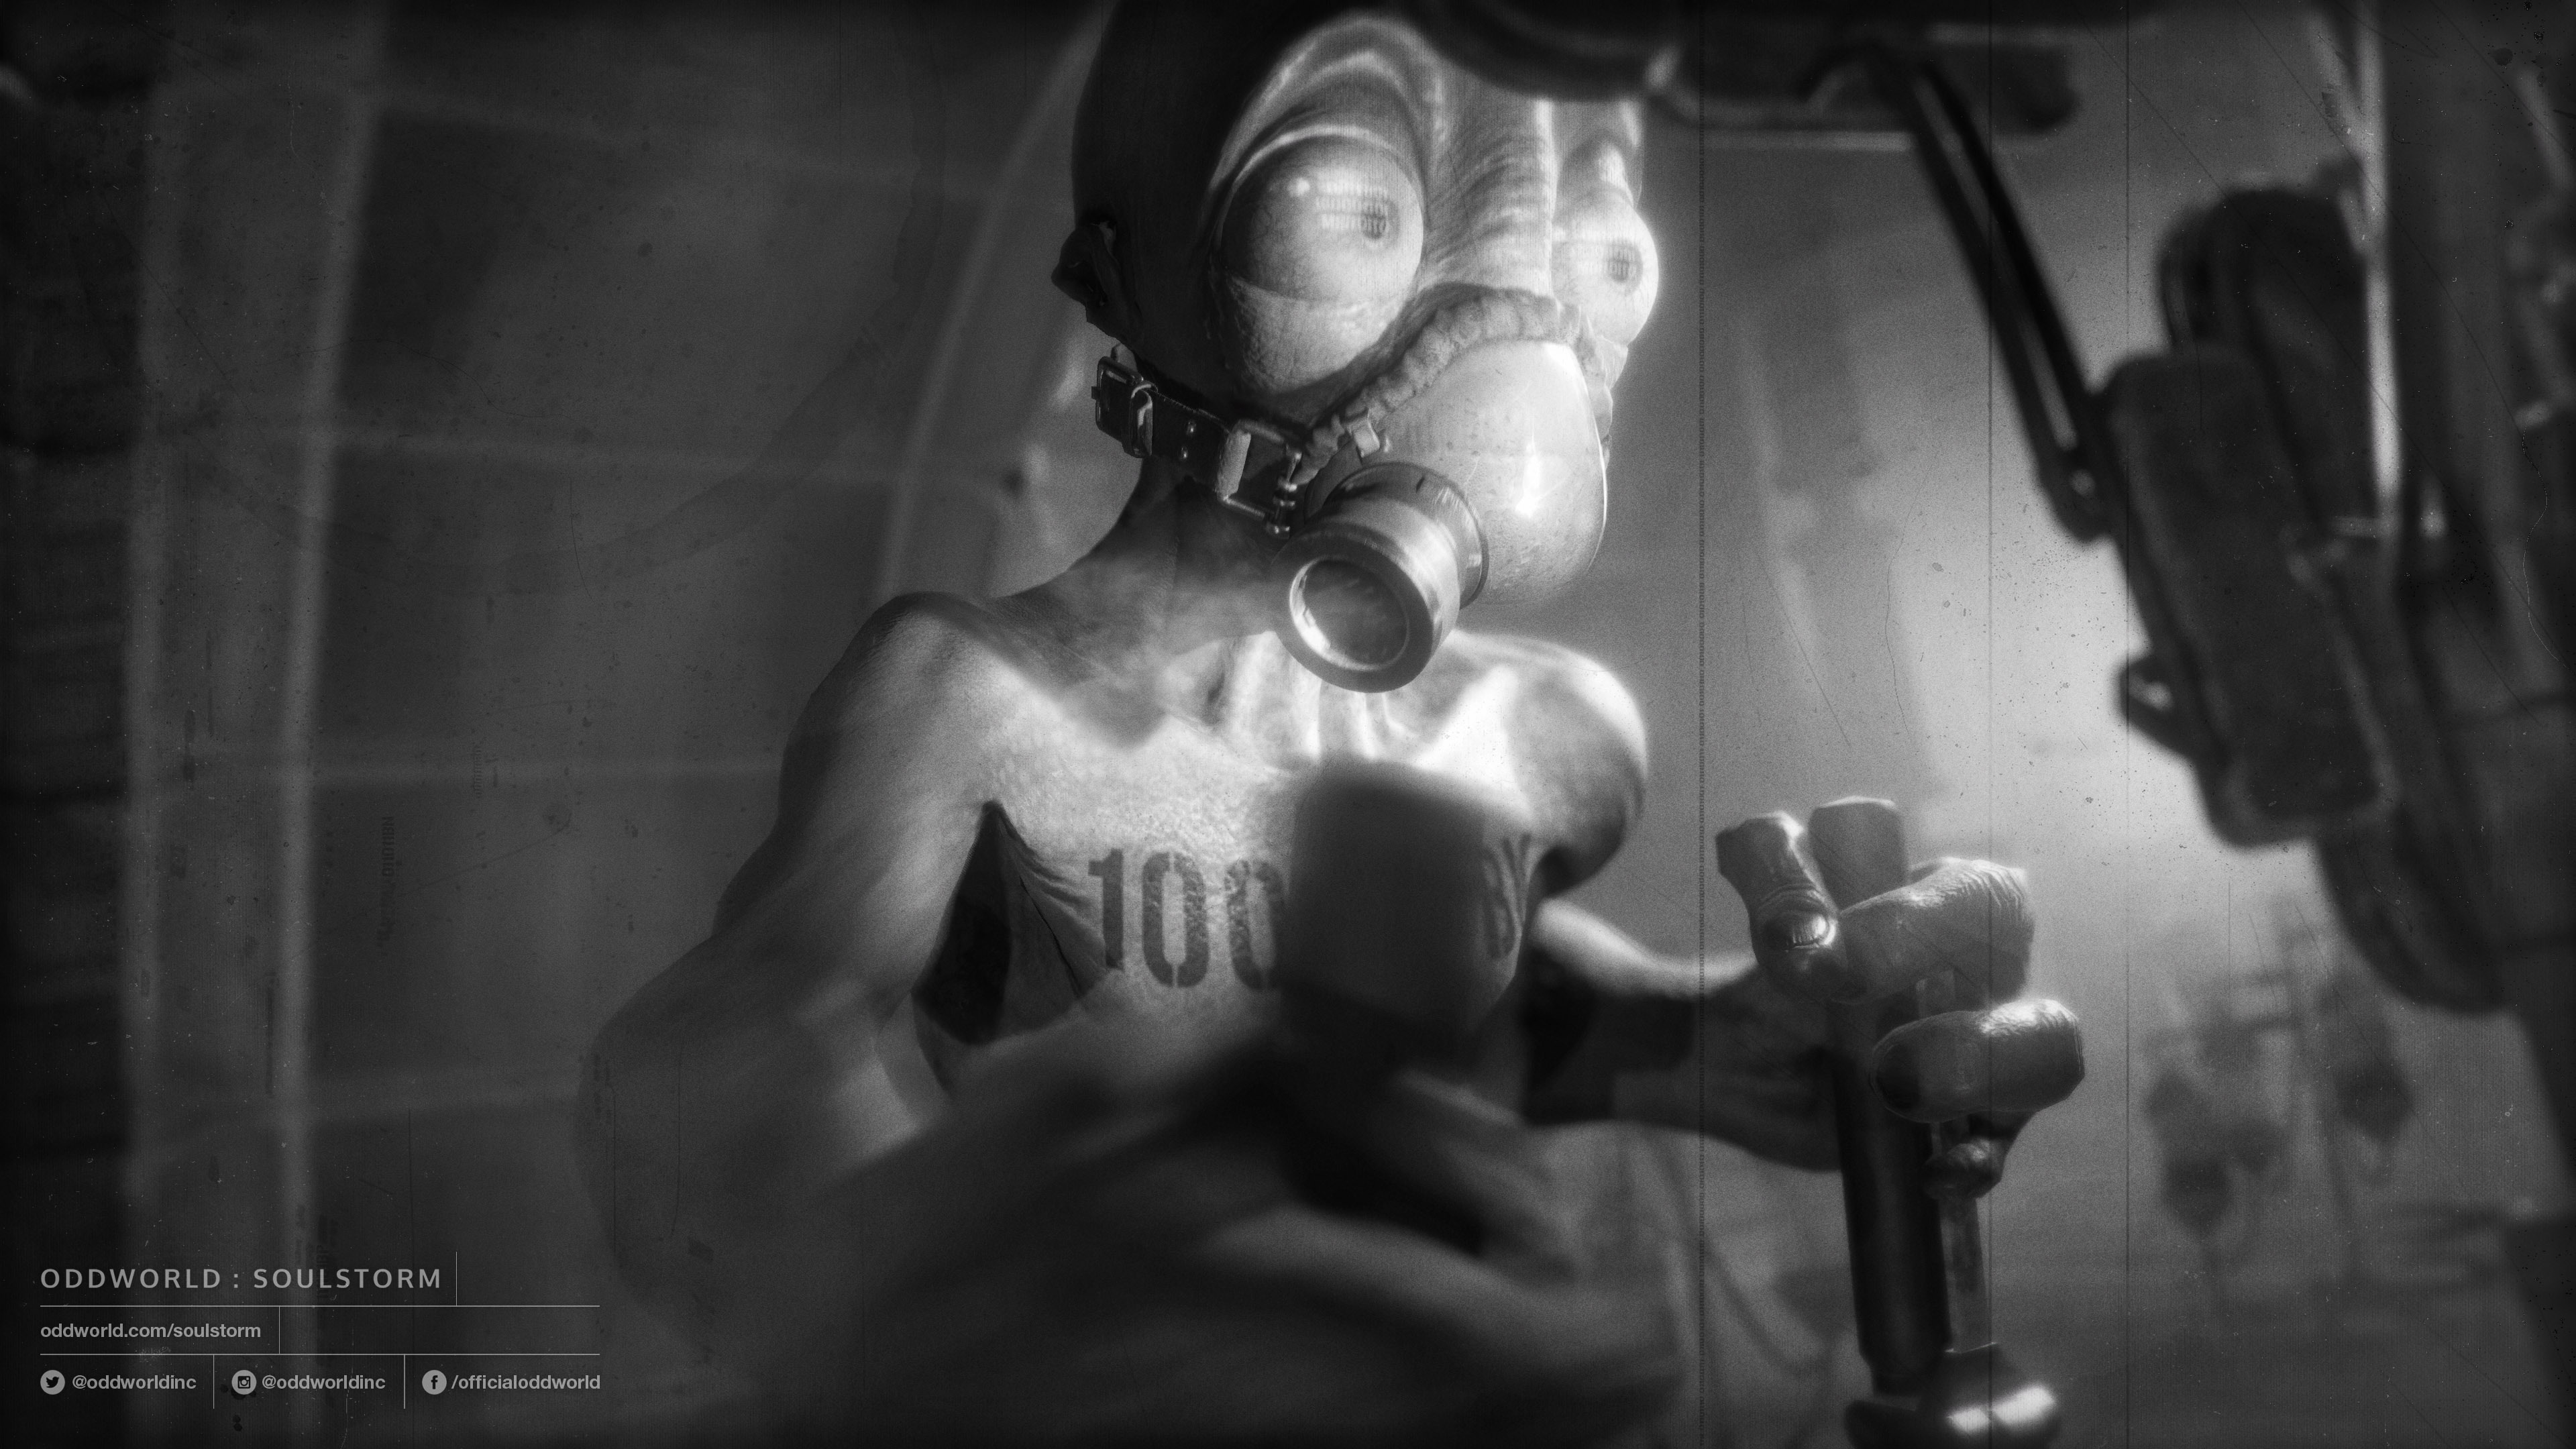 ARG Image 4 - Oddworld: Soulstorm